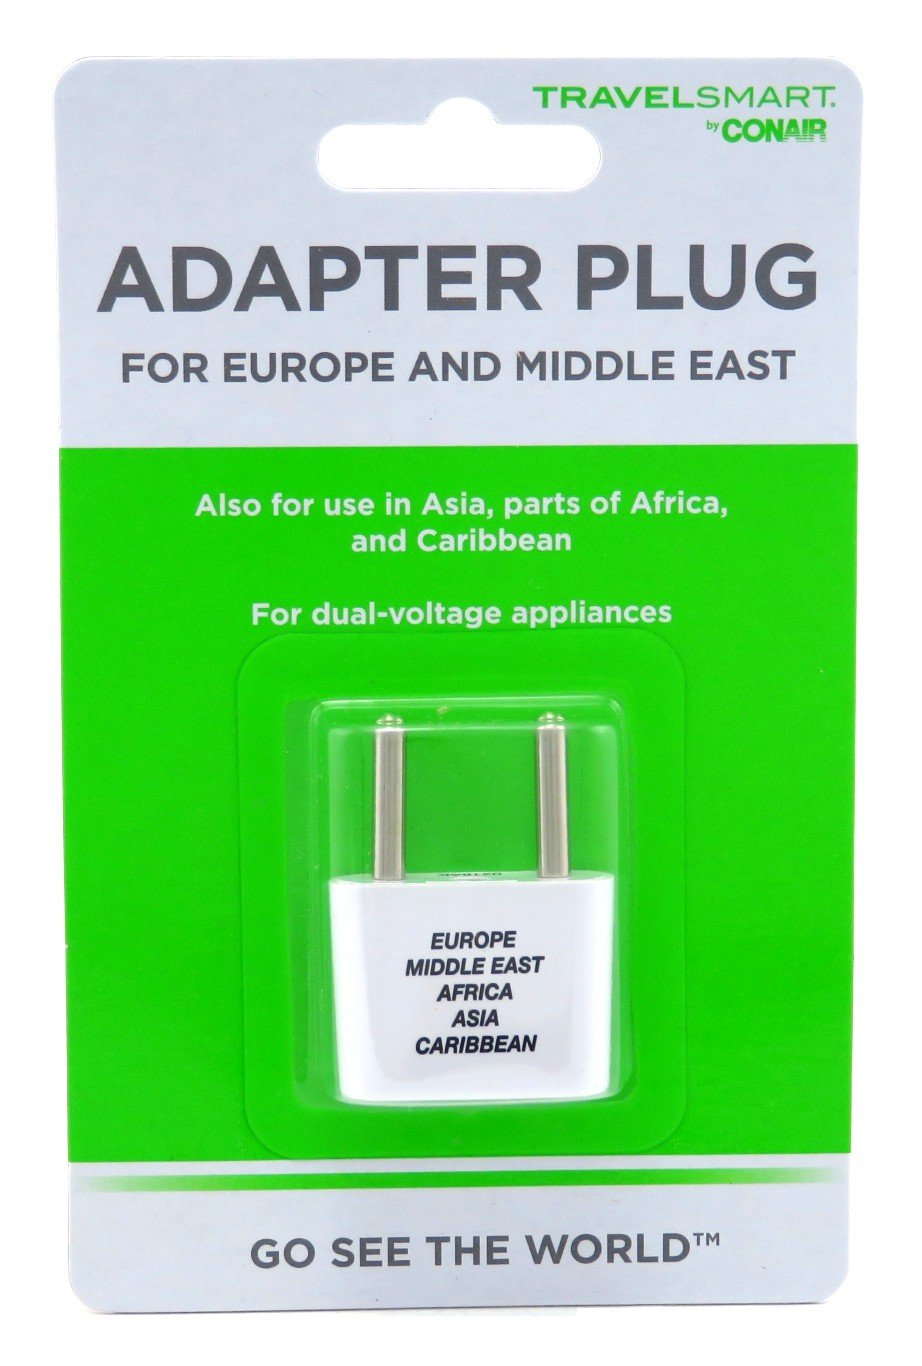 Conair Travel Smart Adapter Plug (6 Pack)